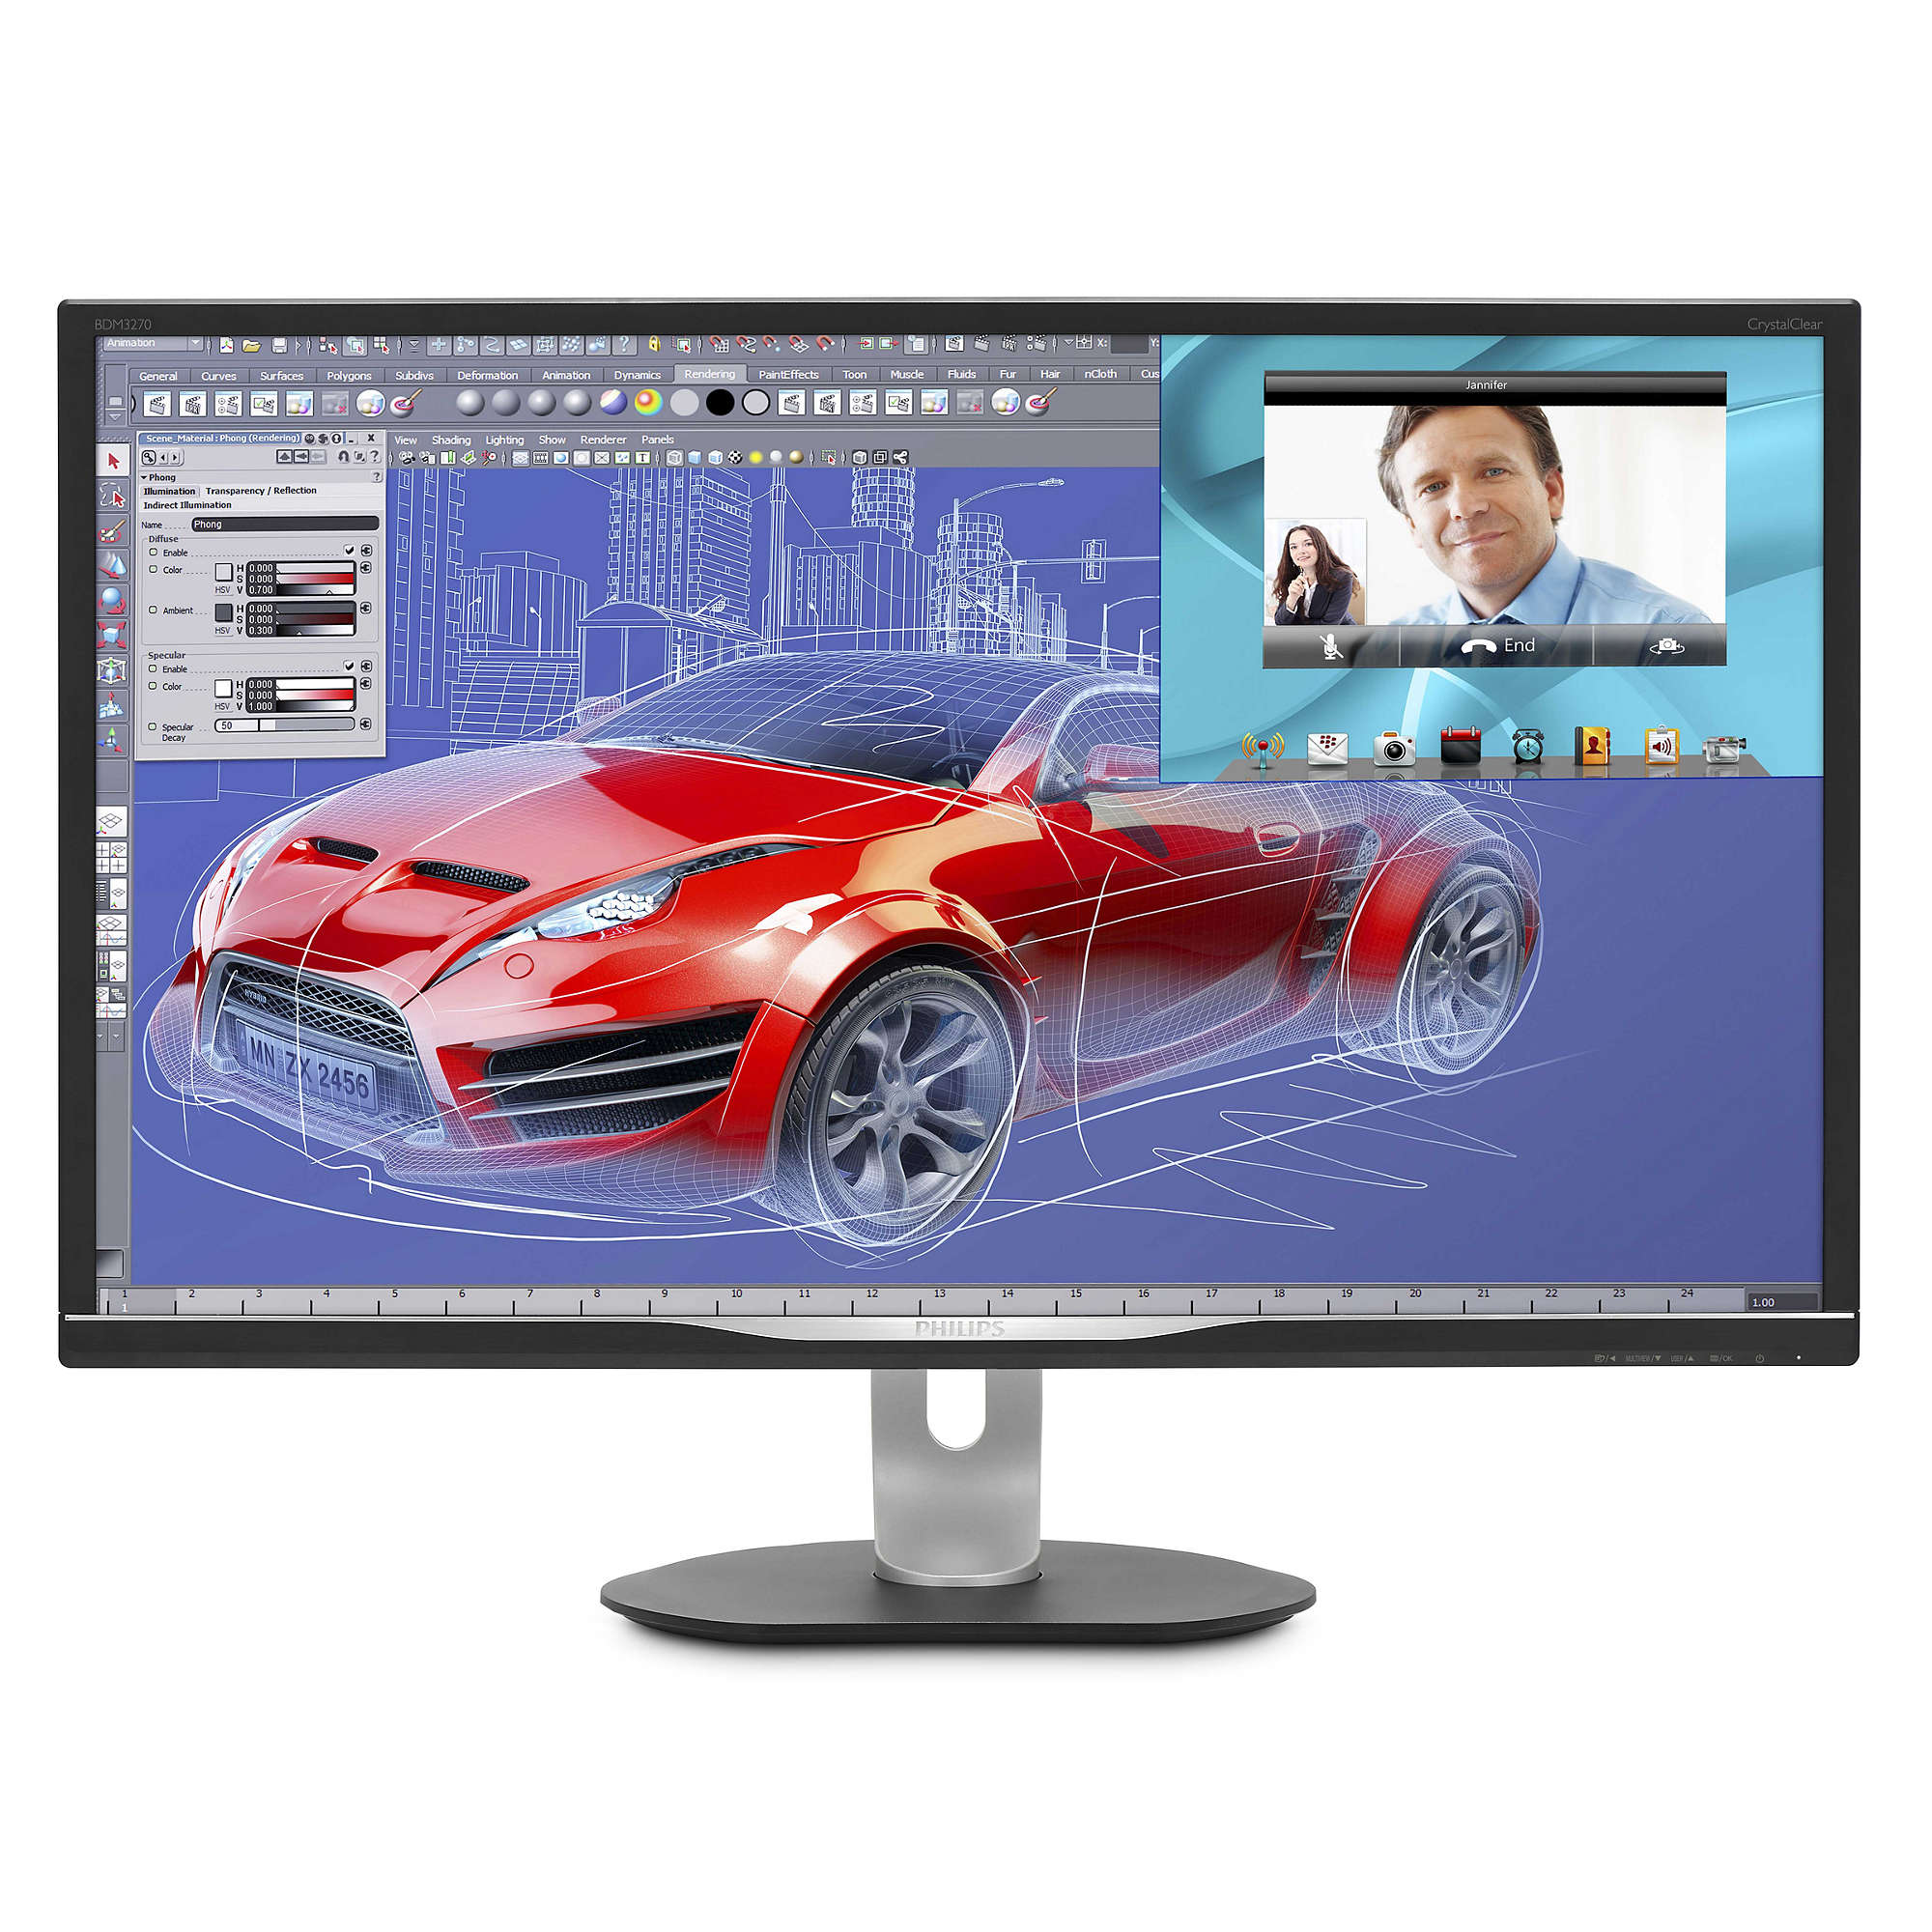 "Philips LCD BDM3270QP 32""wide VA LED/2560x1440/50mil:1/4 ms/VGA/DVI/DP/HDMI/MHL/4xUSB/pivot/repro"